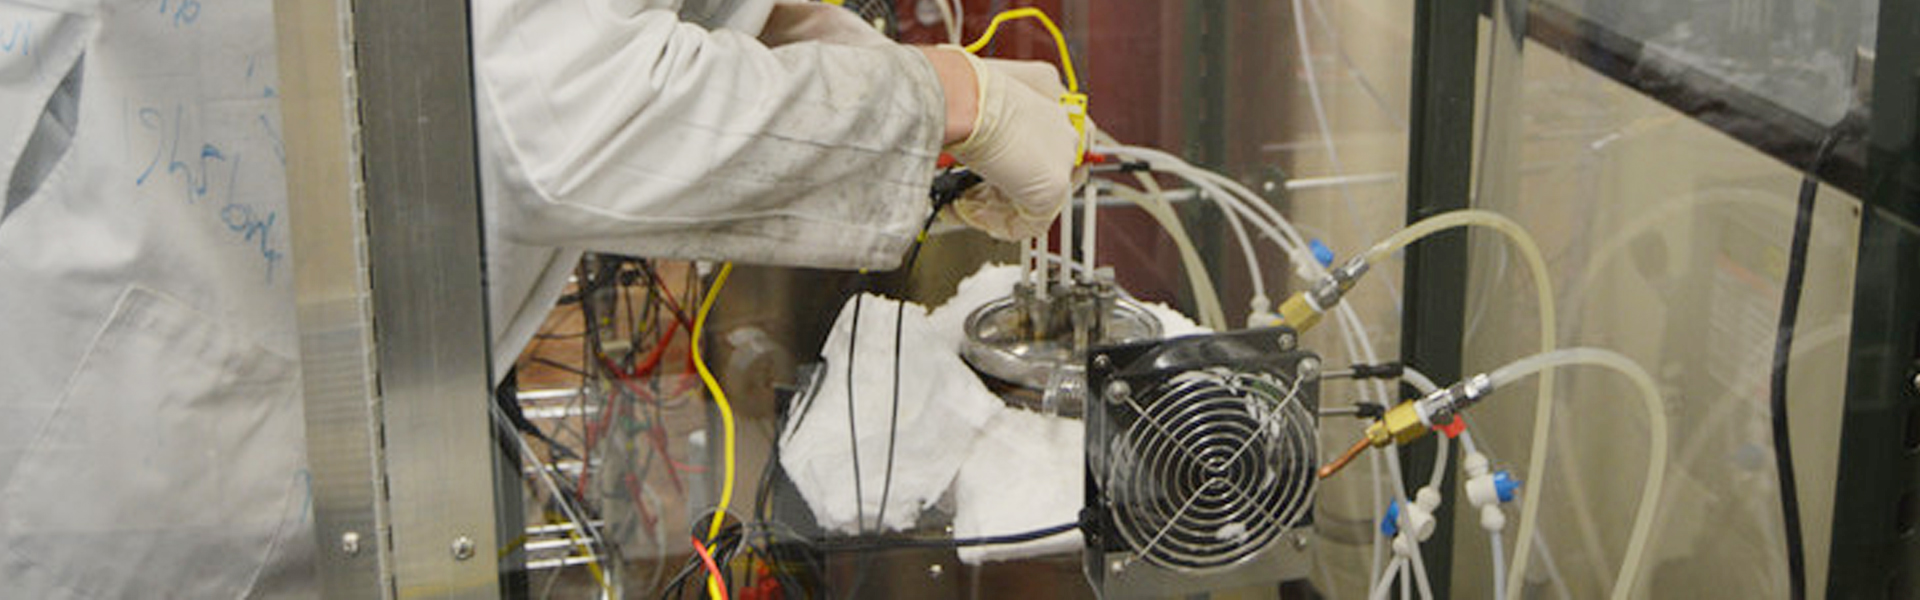 Electrochemistry Equipment